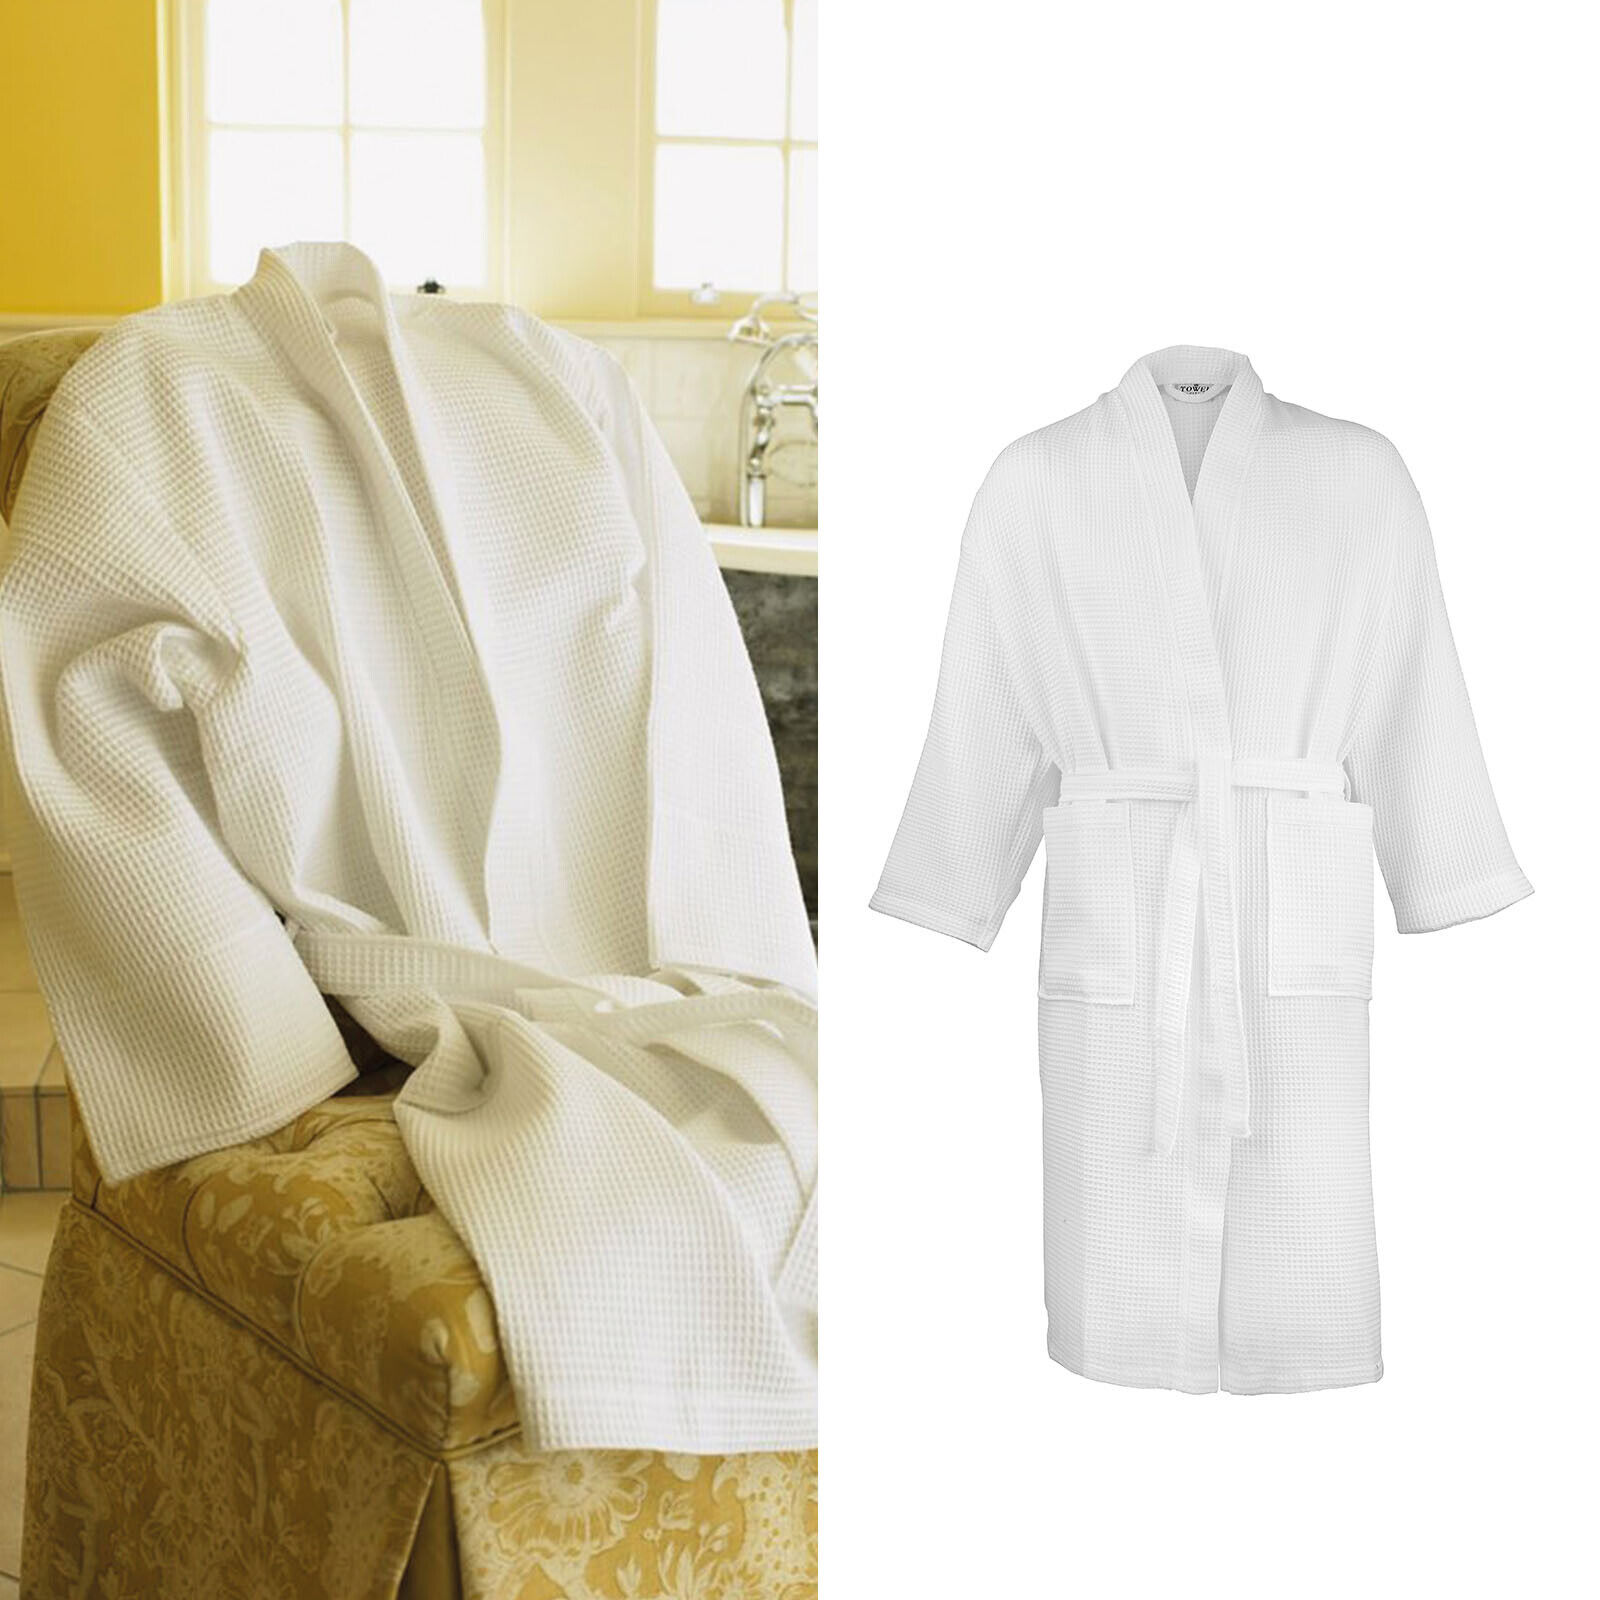 Towel City Cotton Waffle Robe (TC086) - Kimono Style Unisex Dressing Gown